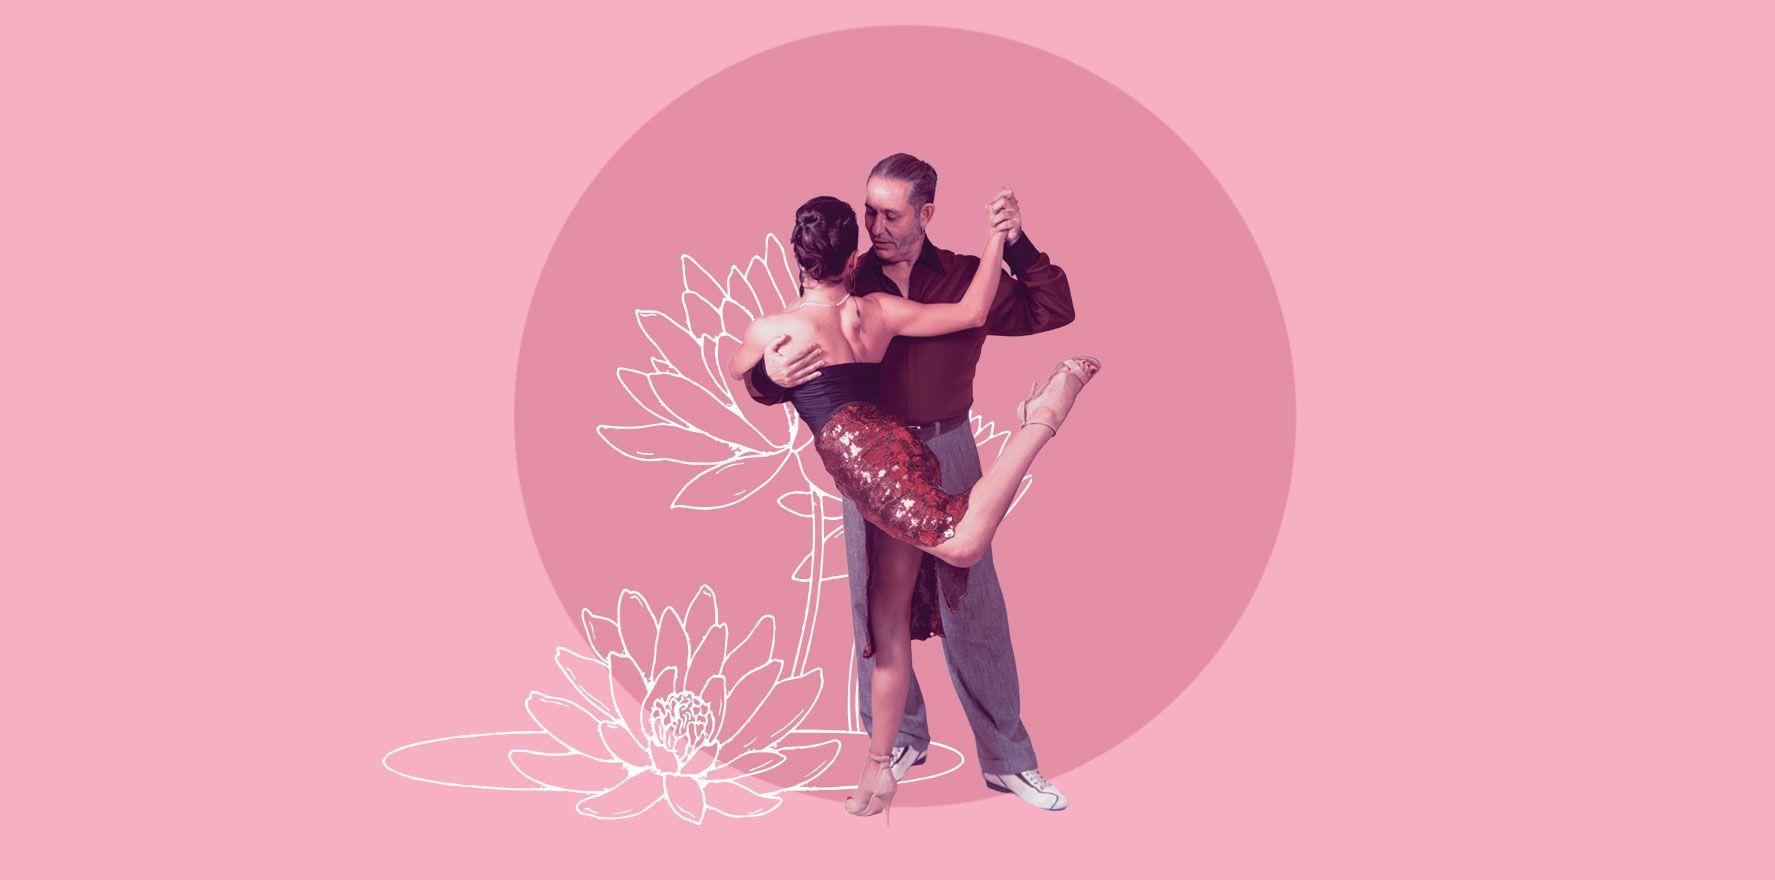 Clases Privadas - Tango Desbande